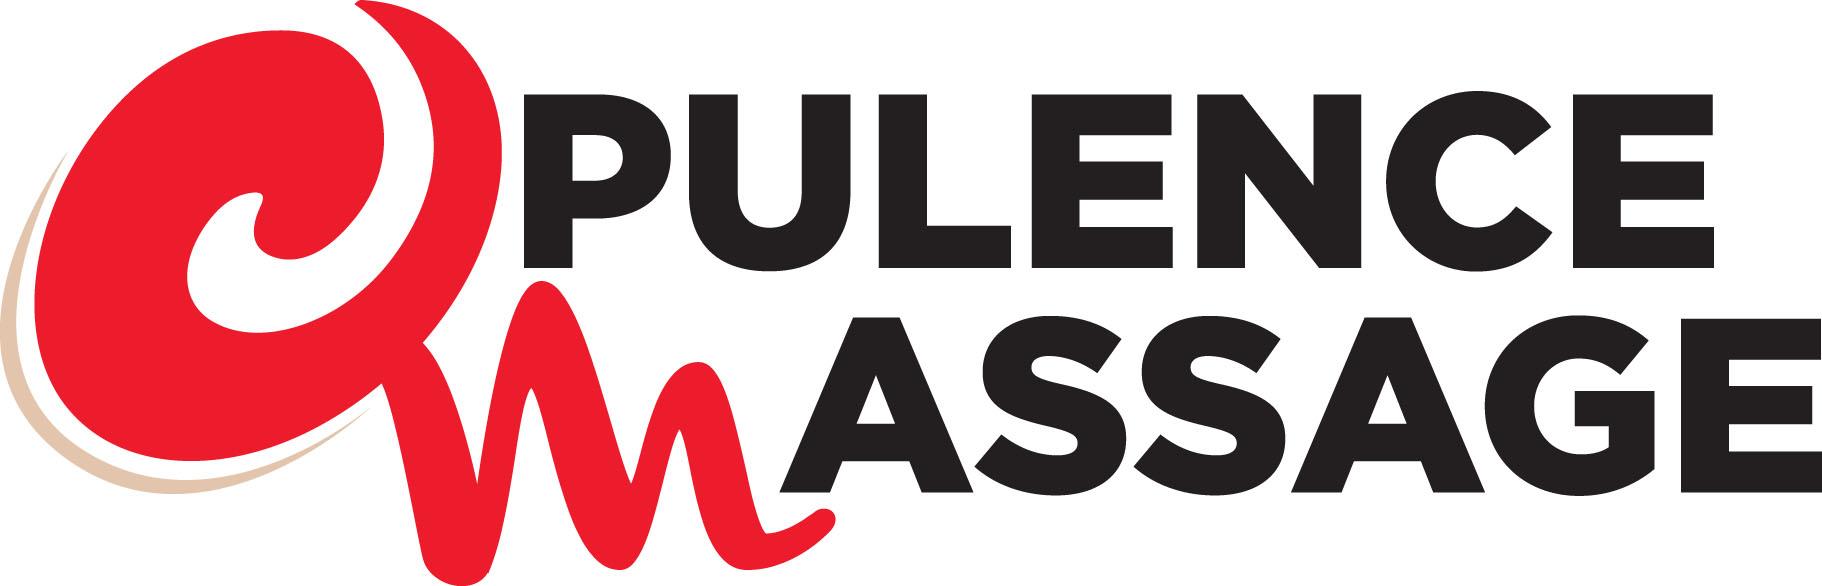 Opulence Massage logo.jpg